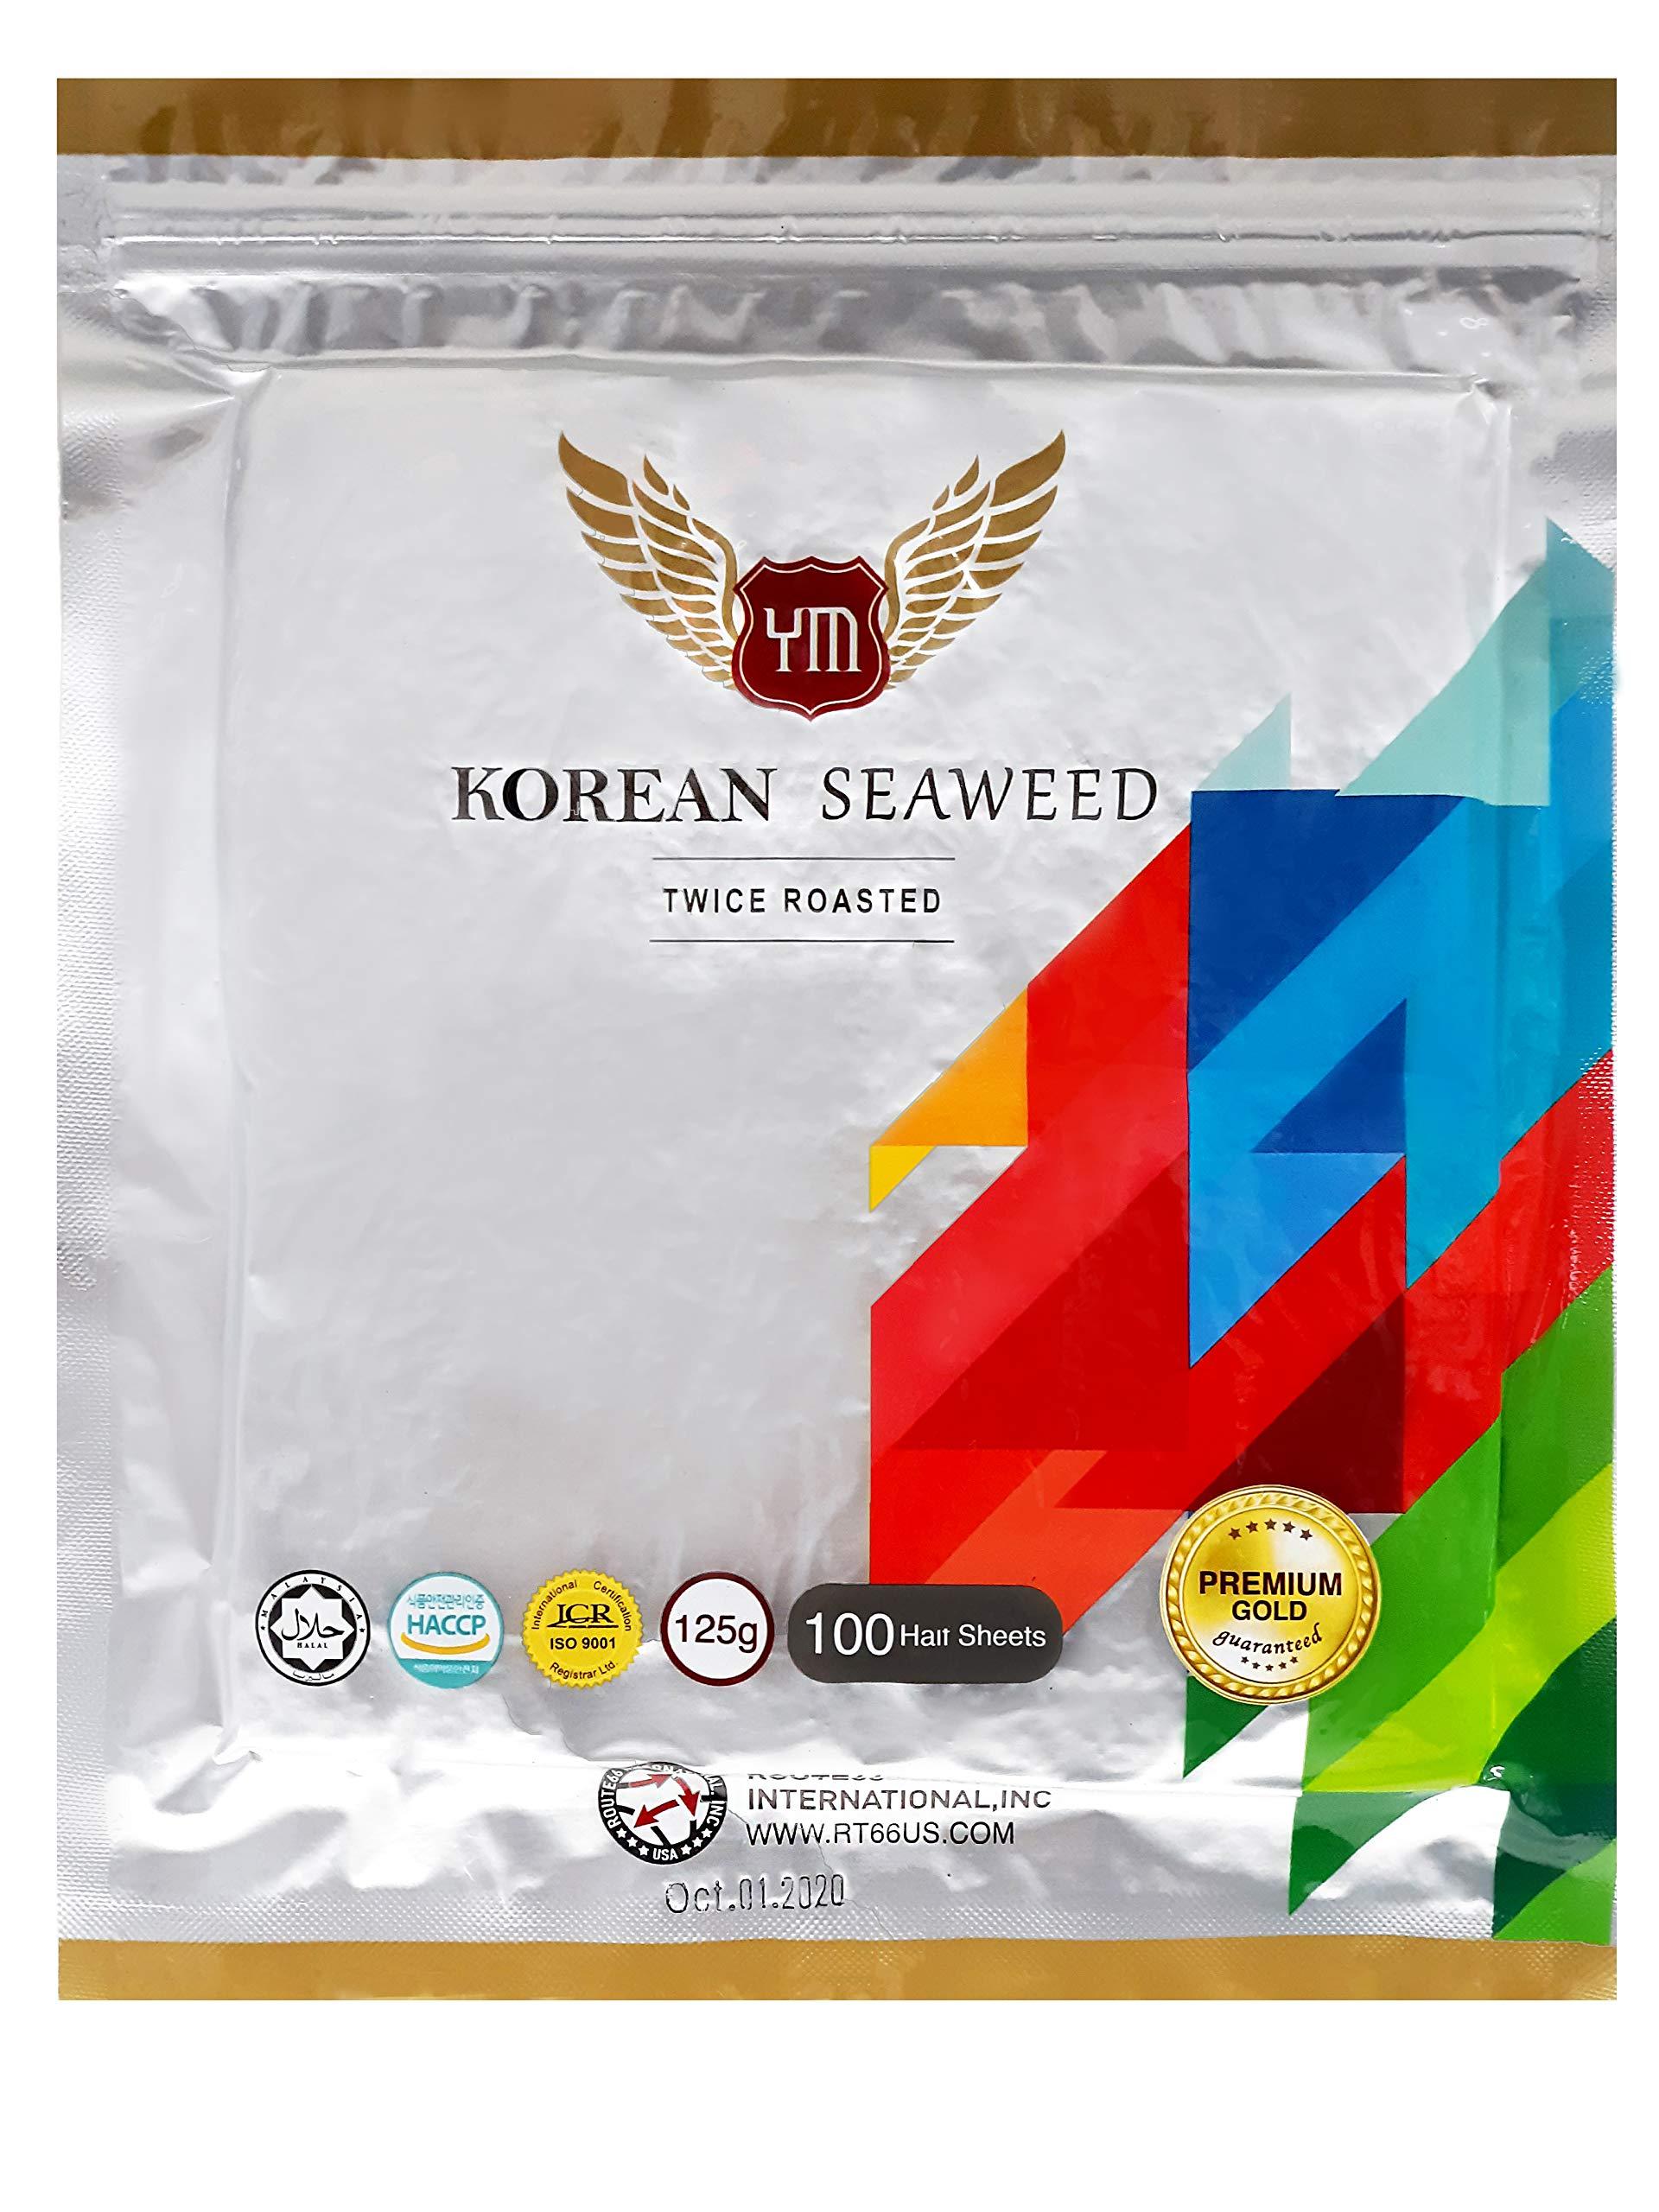 YM Korean Roasted Seaweed Premium Sushi Nori   Premium Gold Grade   Twice Roasted   100% Natural Korean Seaweed   100 Half Sheets (1 Pack) by YM (Image #1)